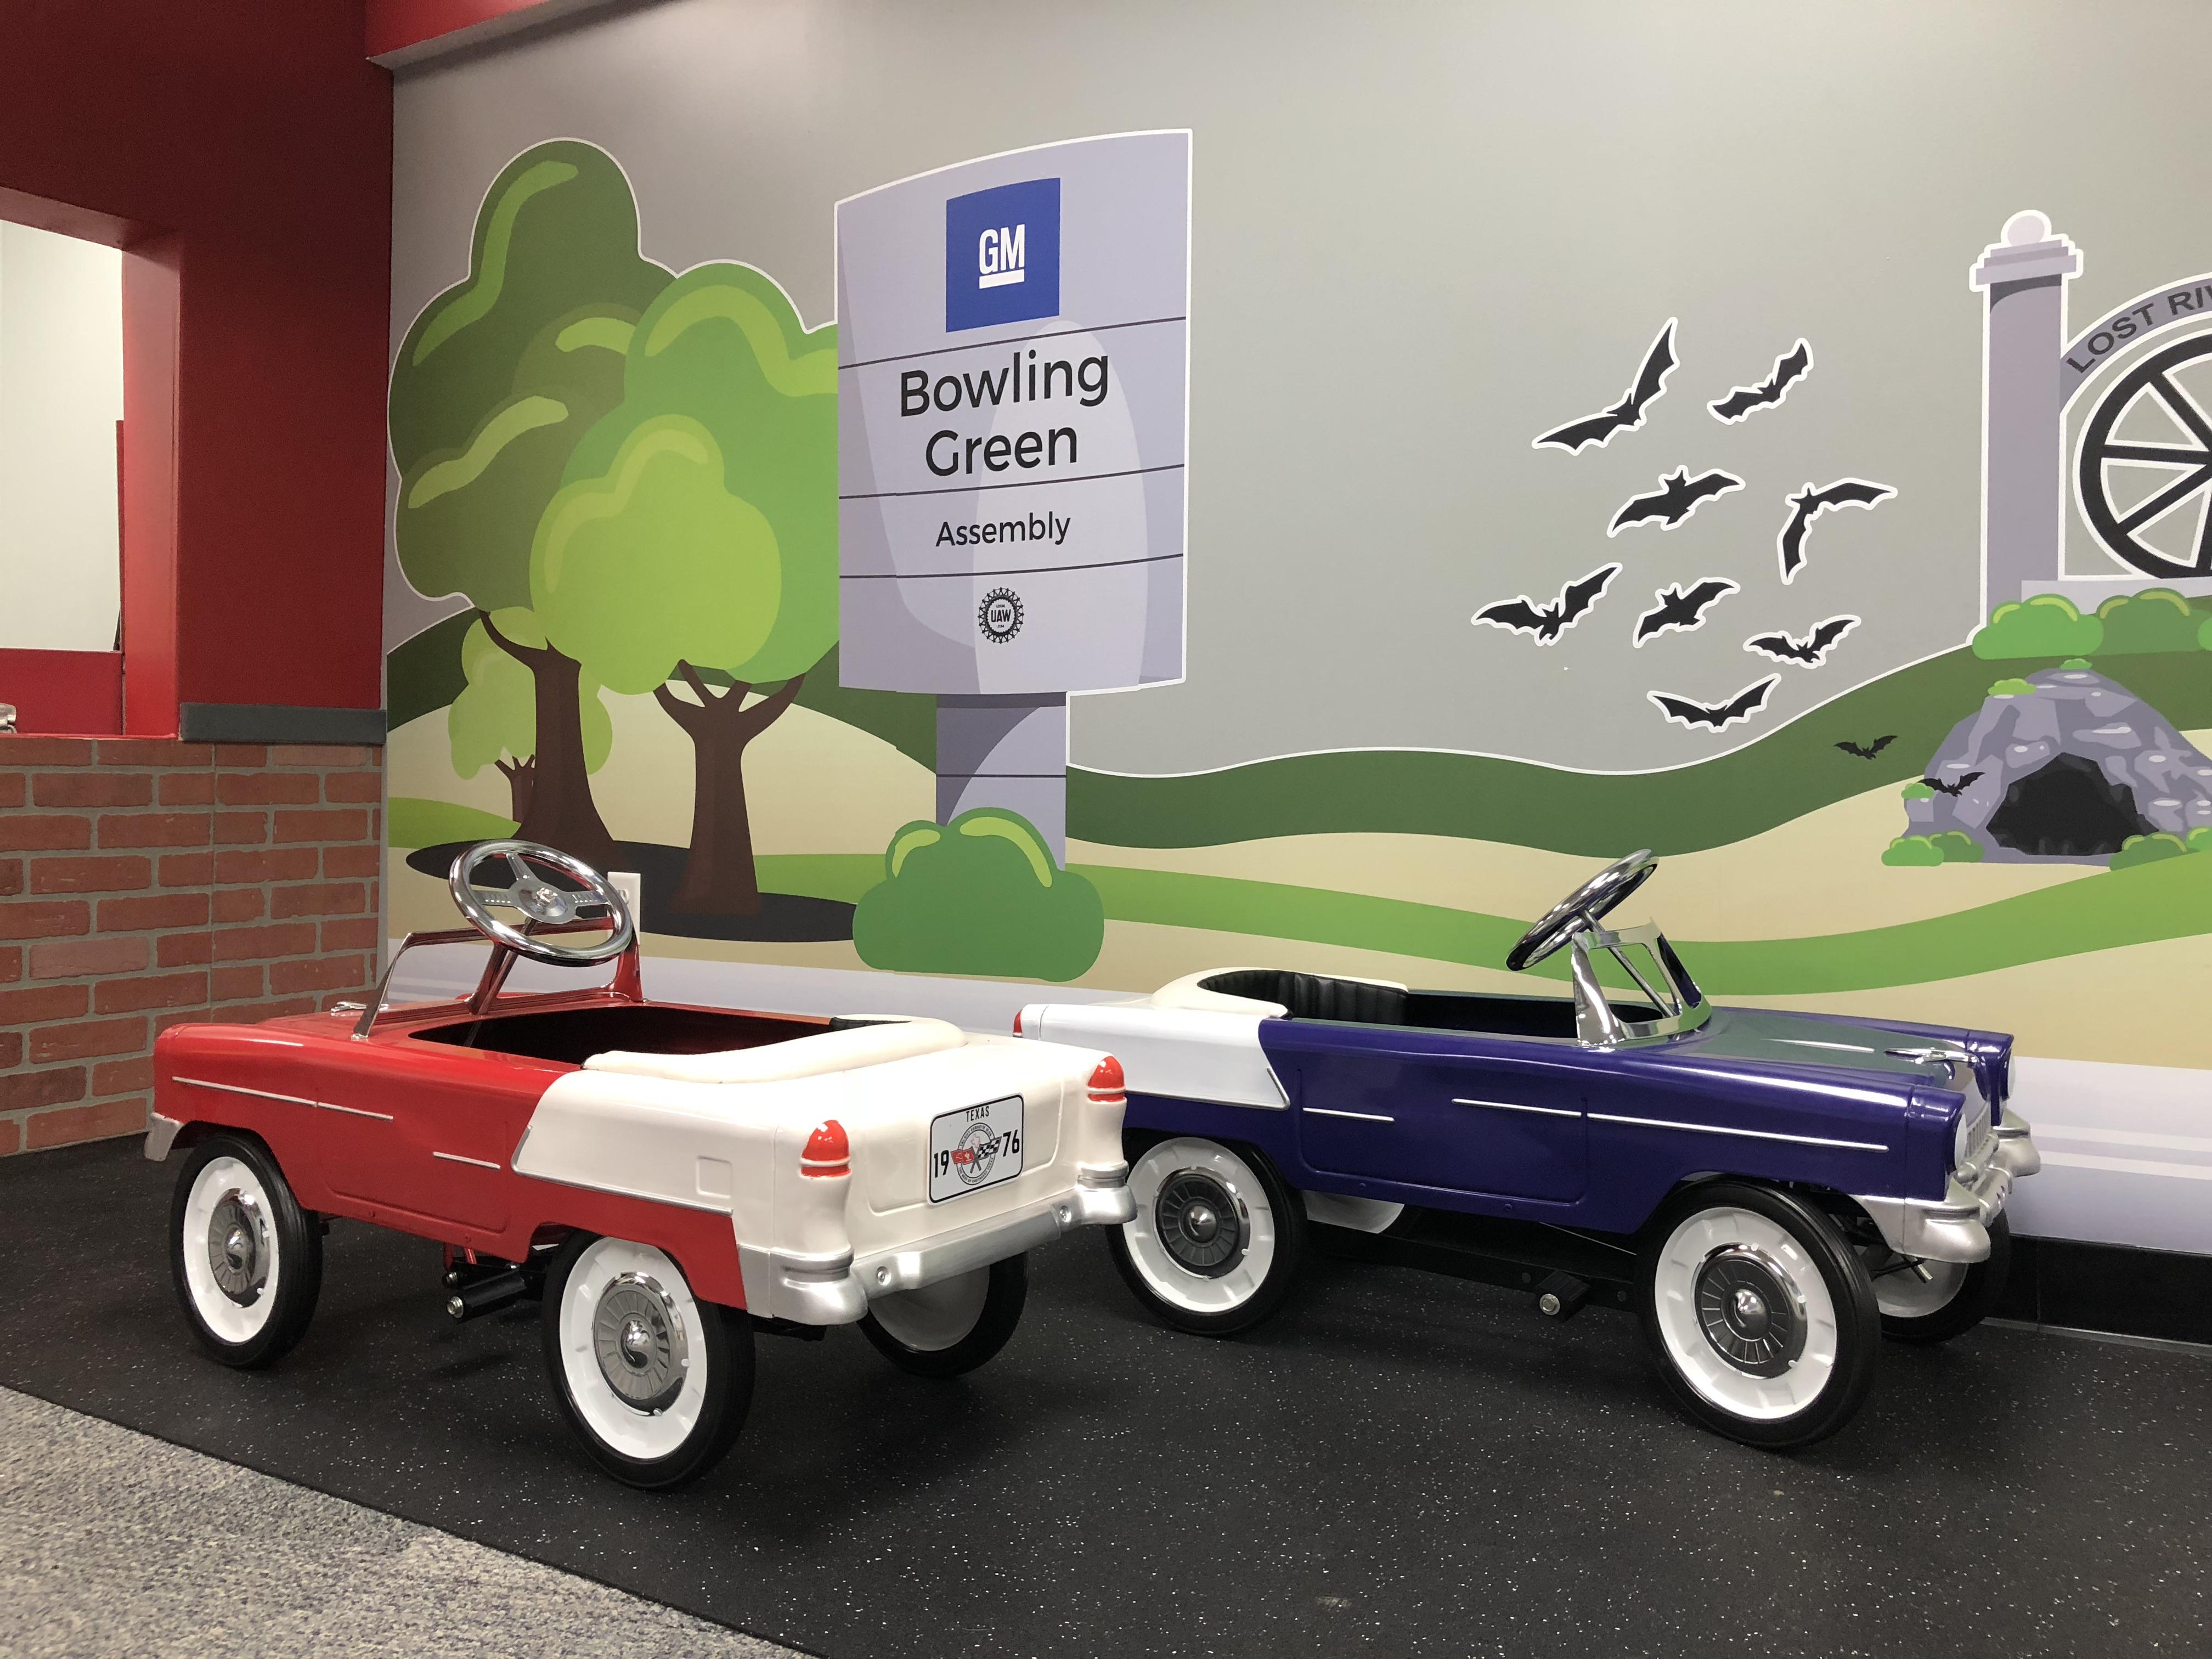 Trabant, Spy museum celebrates East Germany's Trabant, ClassicCars.com Journal